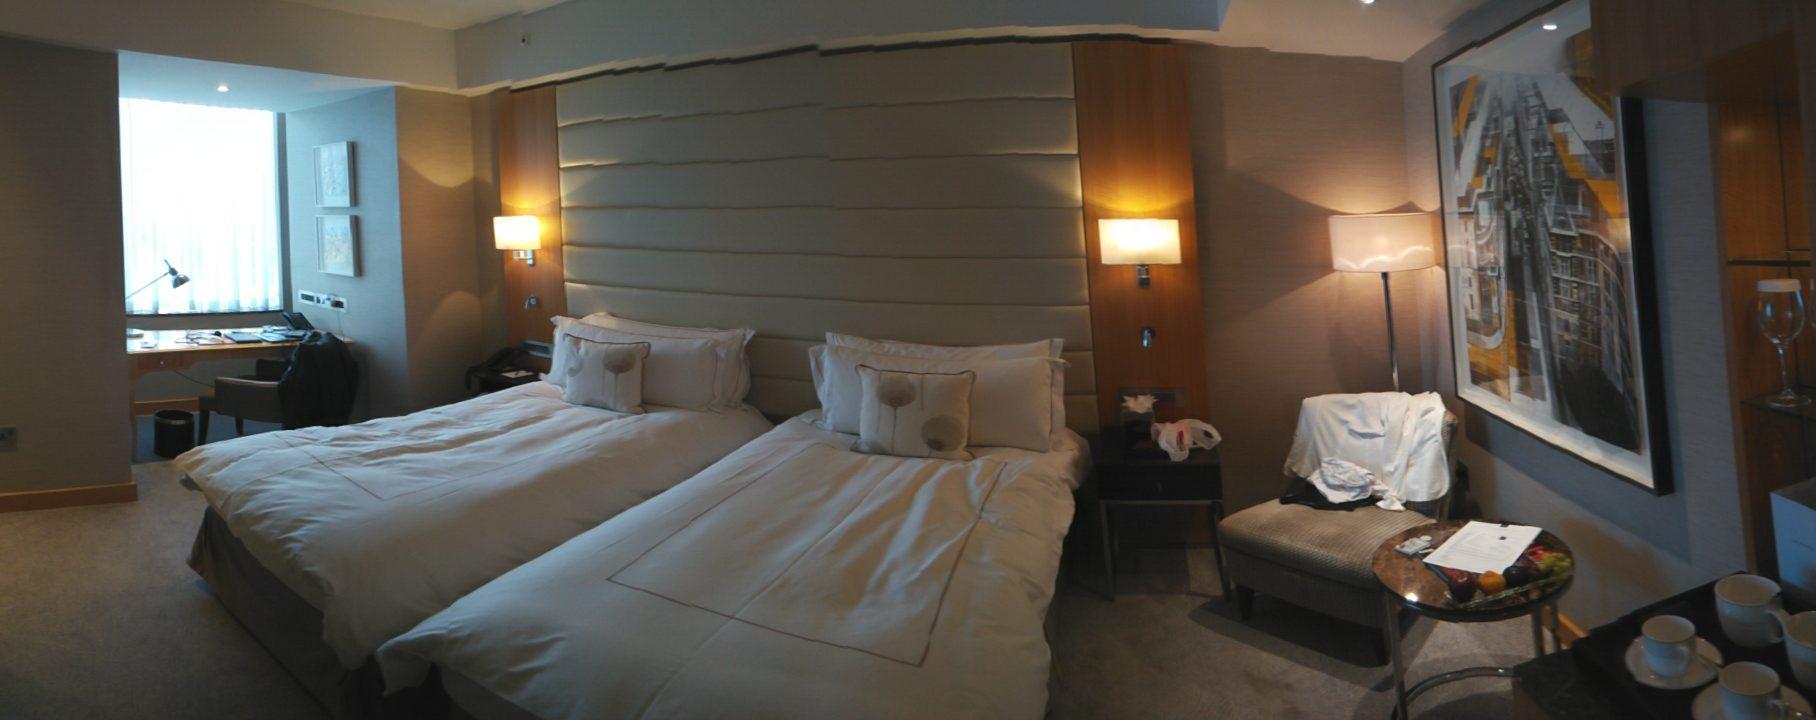 conrad-st-james-room